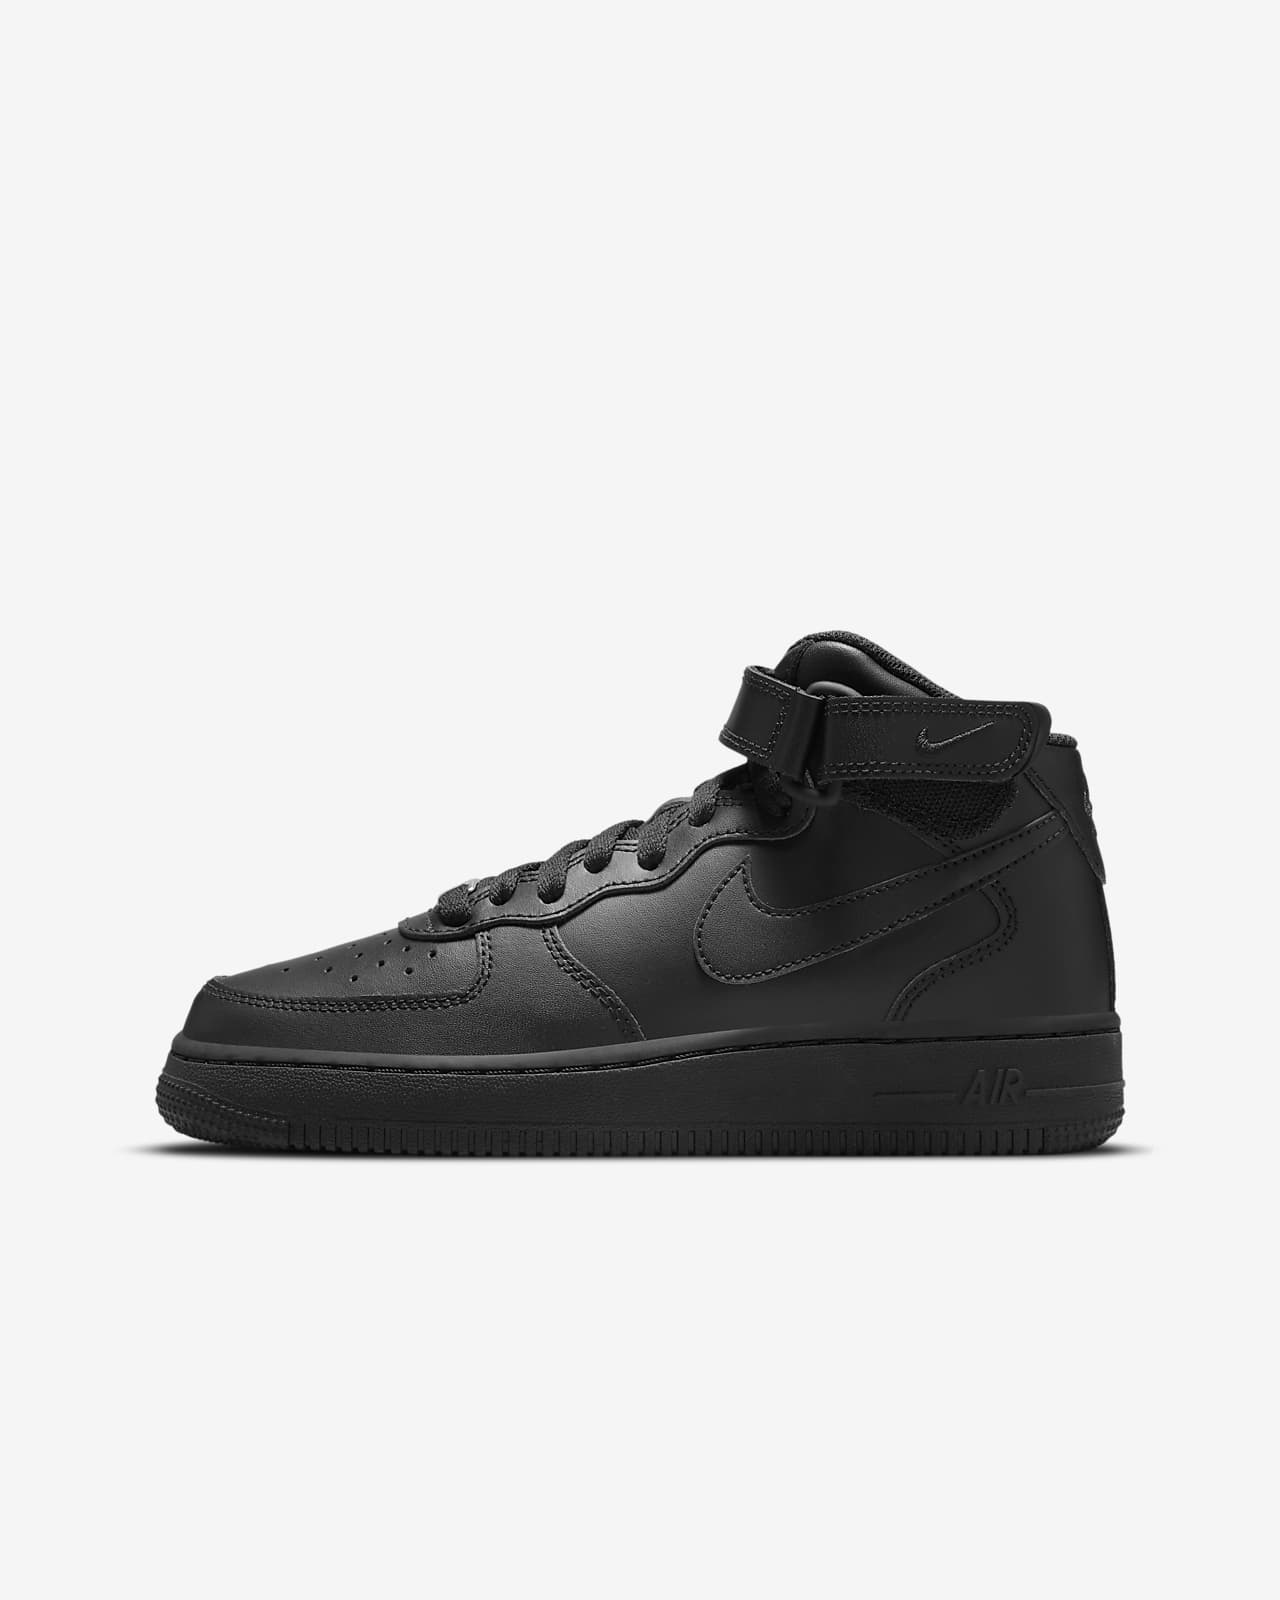 Calzado para niños talla grande Nike Air Force 1 Mid LE